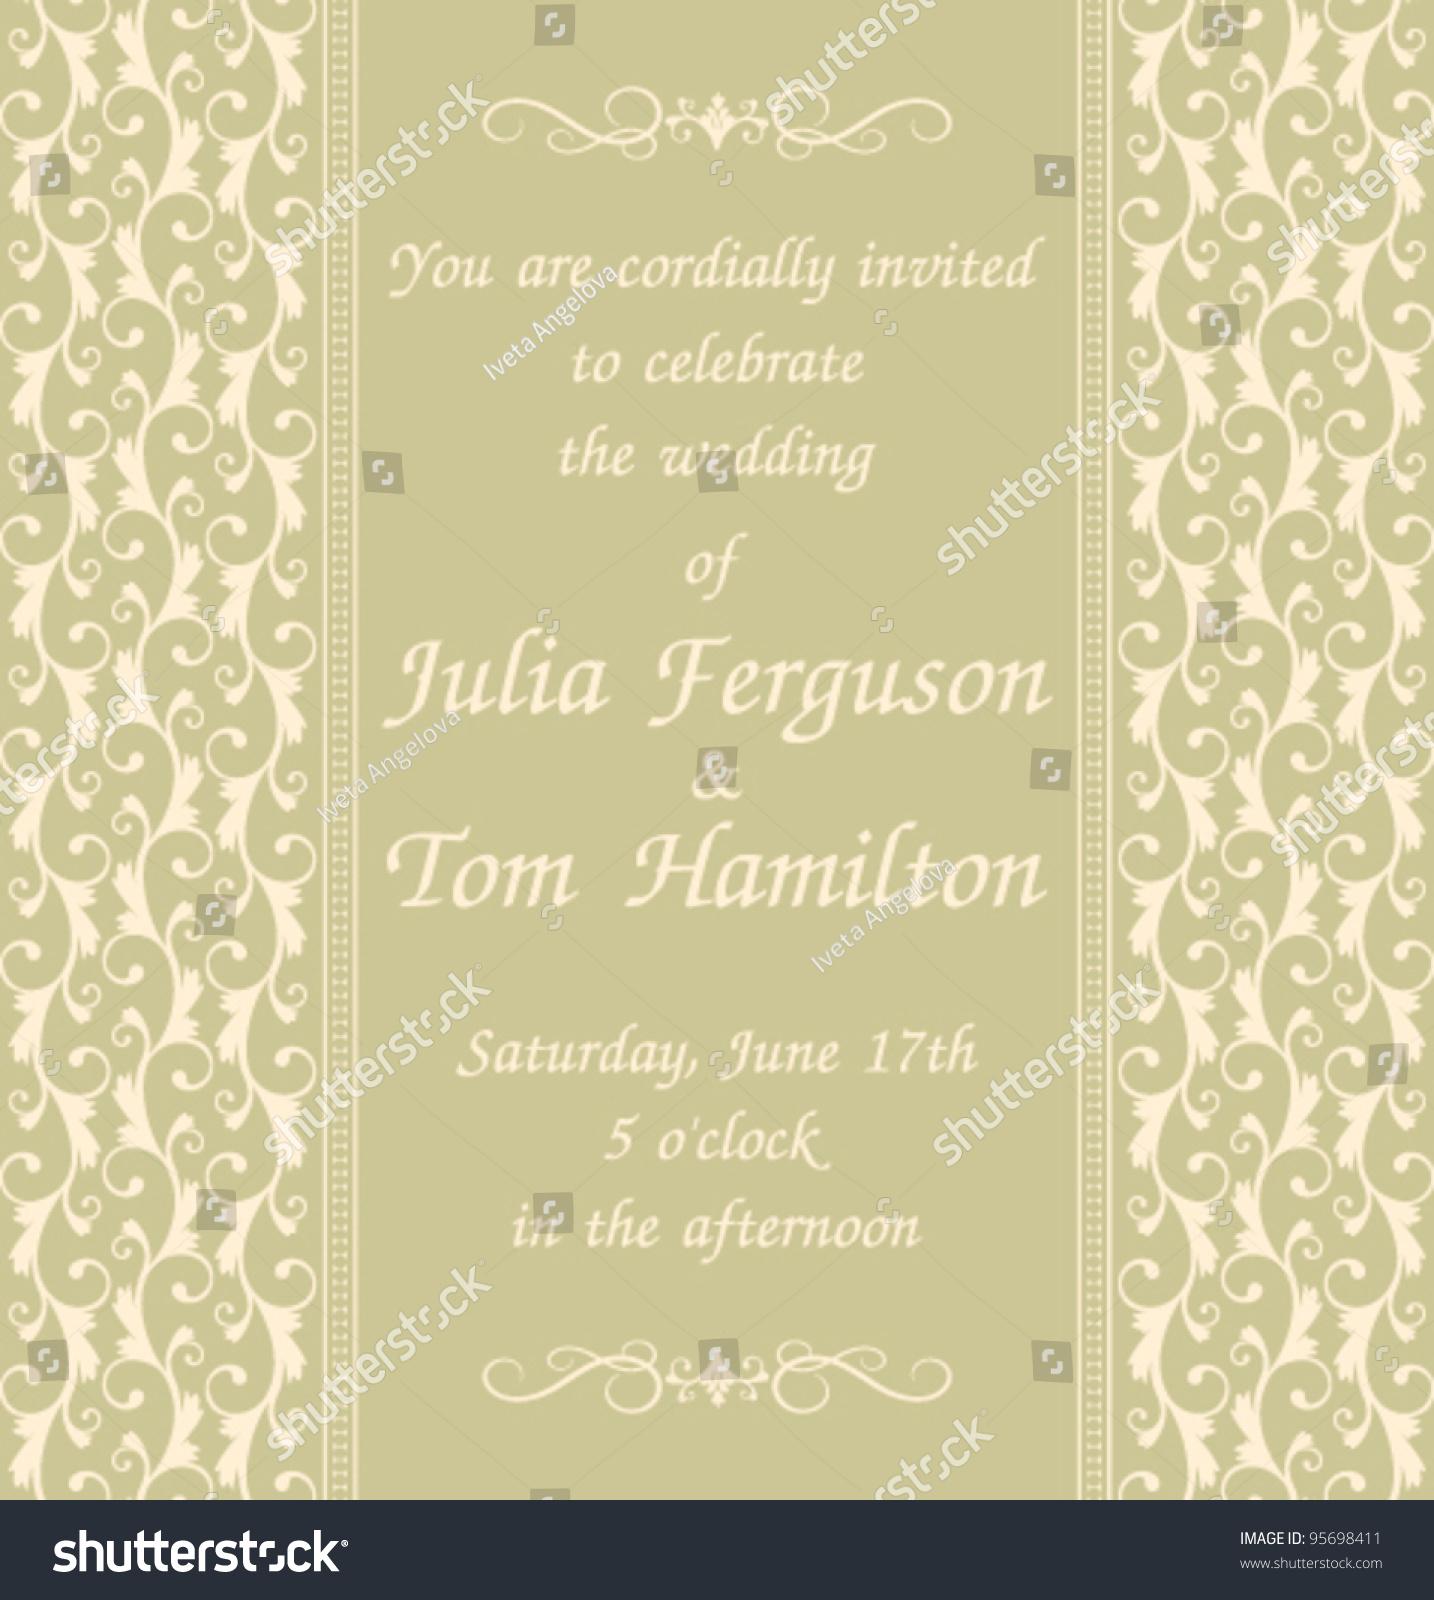 Elegant Wedding Invitation Template Green Background Stock Vector ...